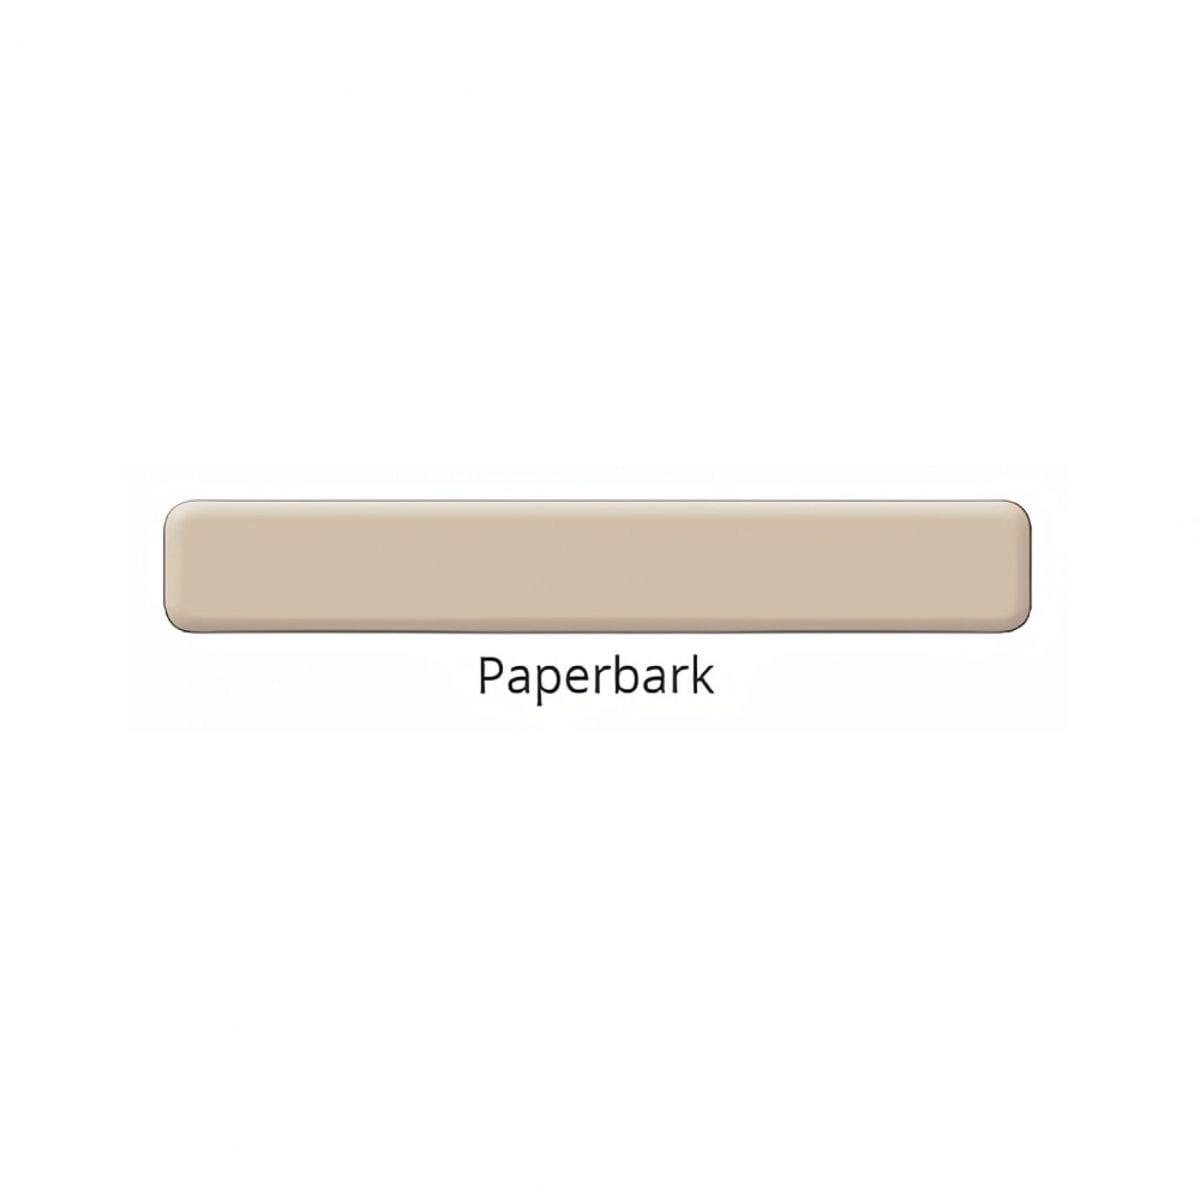 Paperbark color